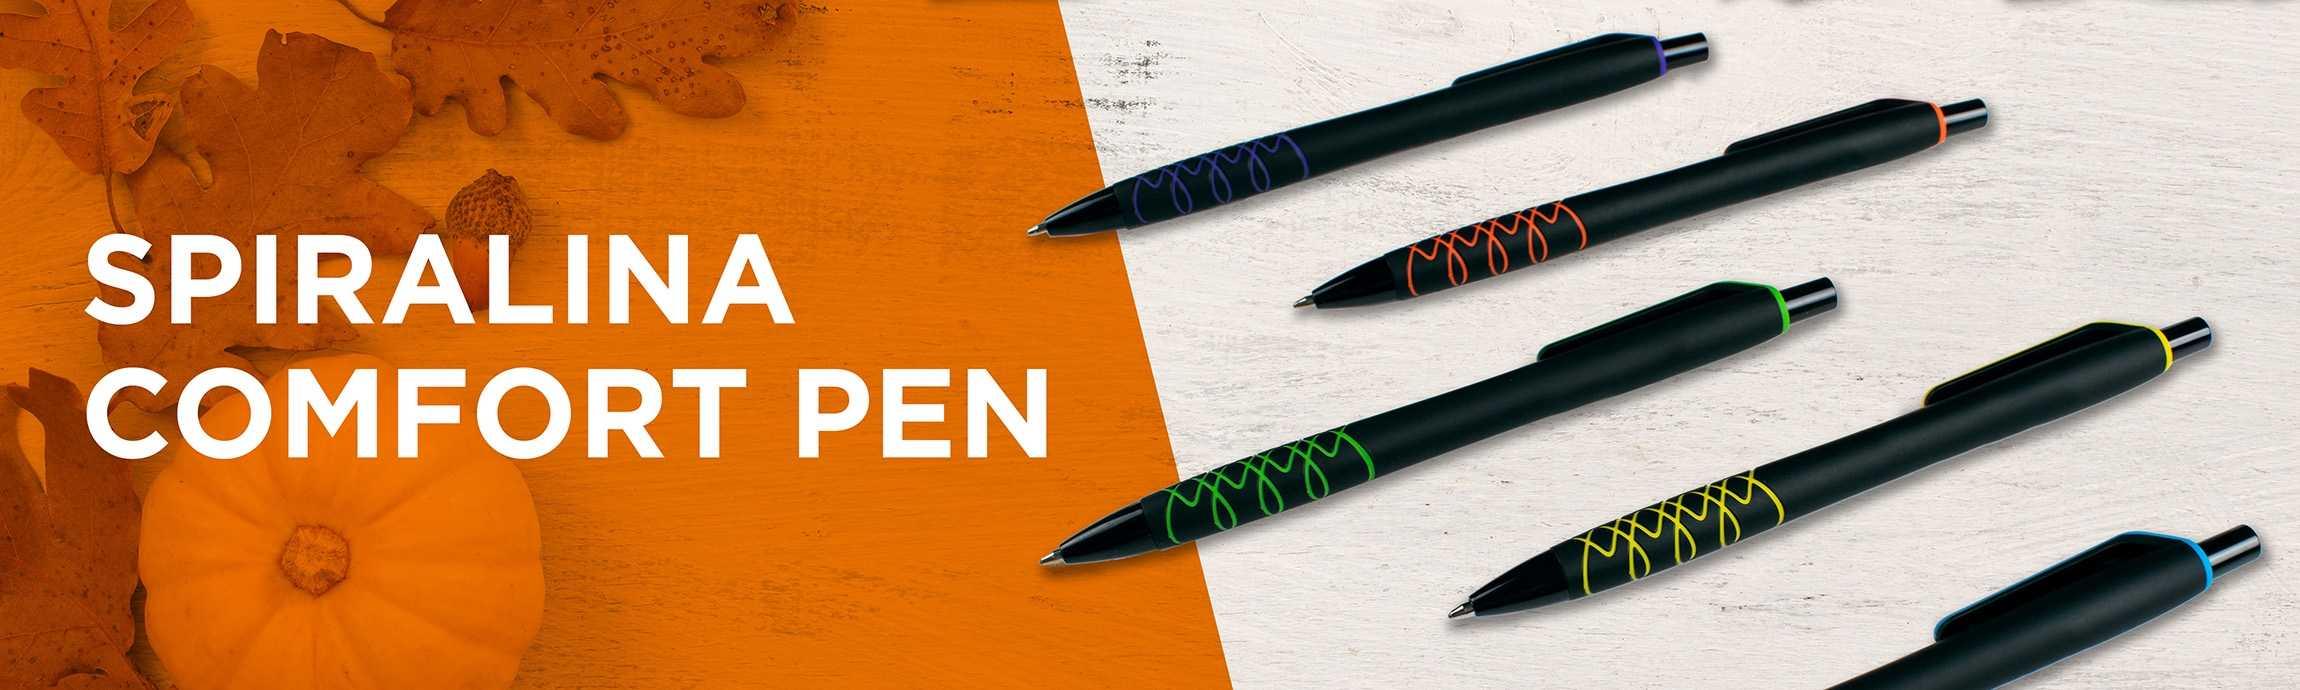 Spiralina Comfort Pen AIM